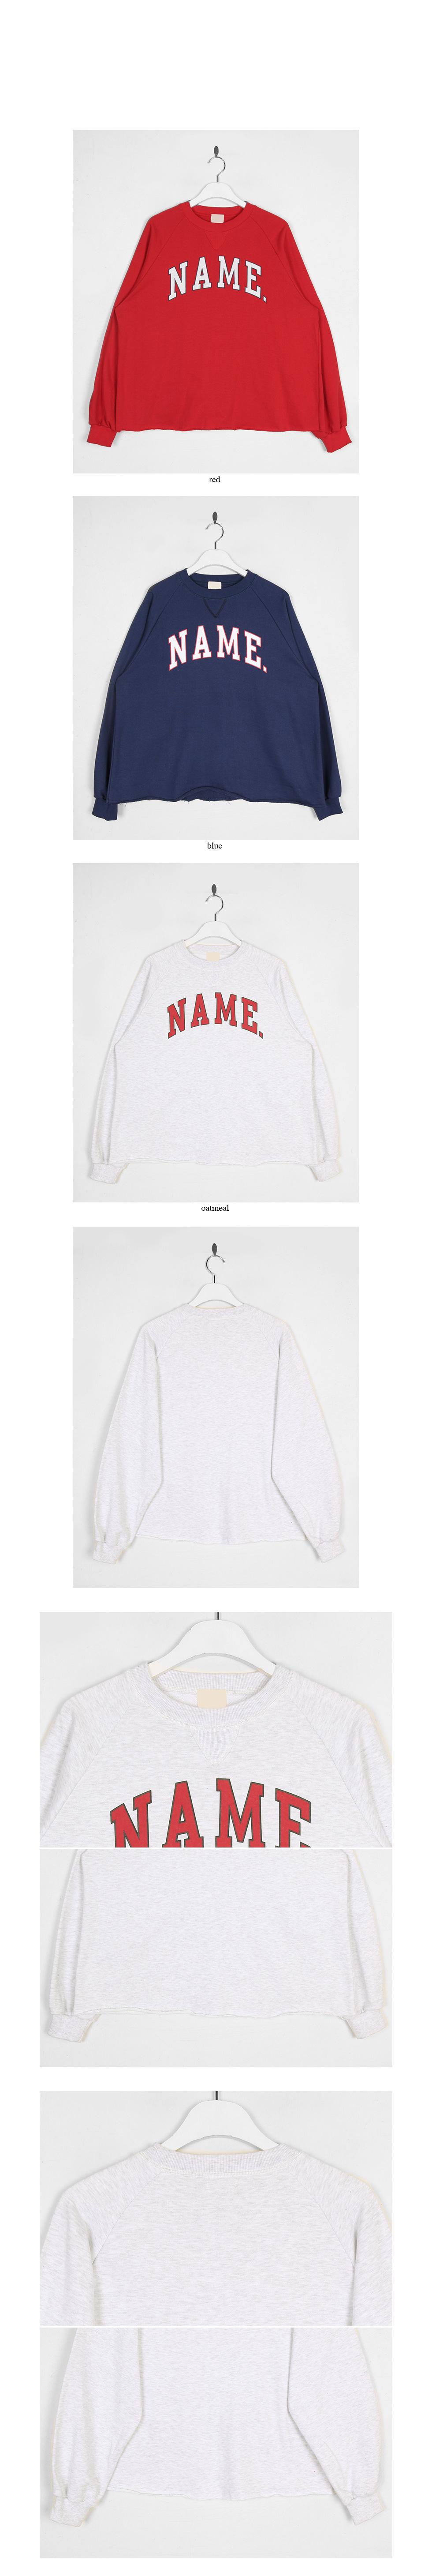 name raglan sweatshirt